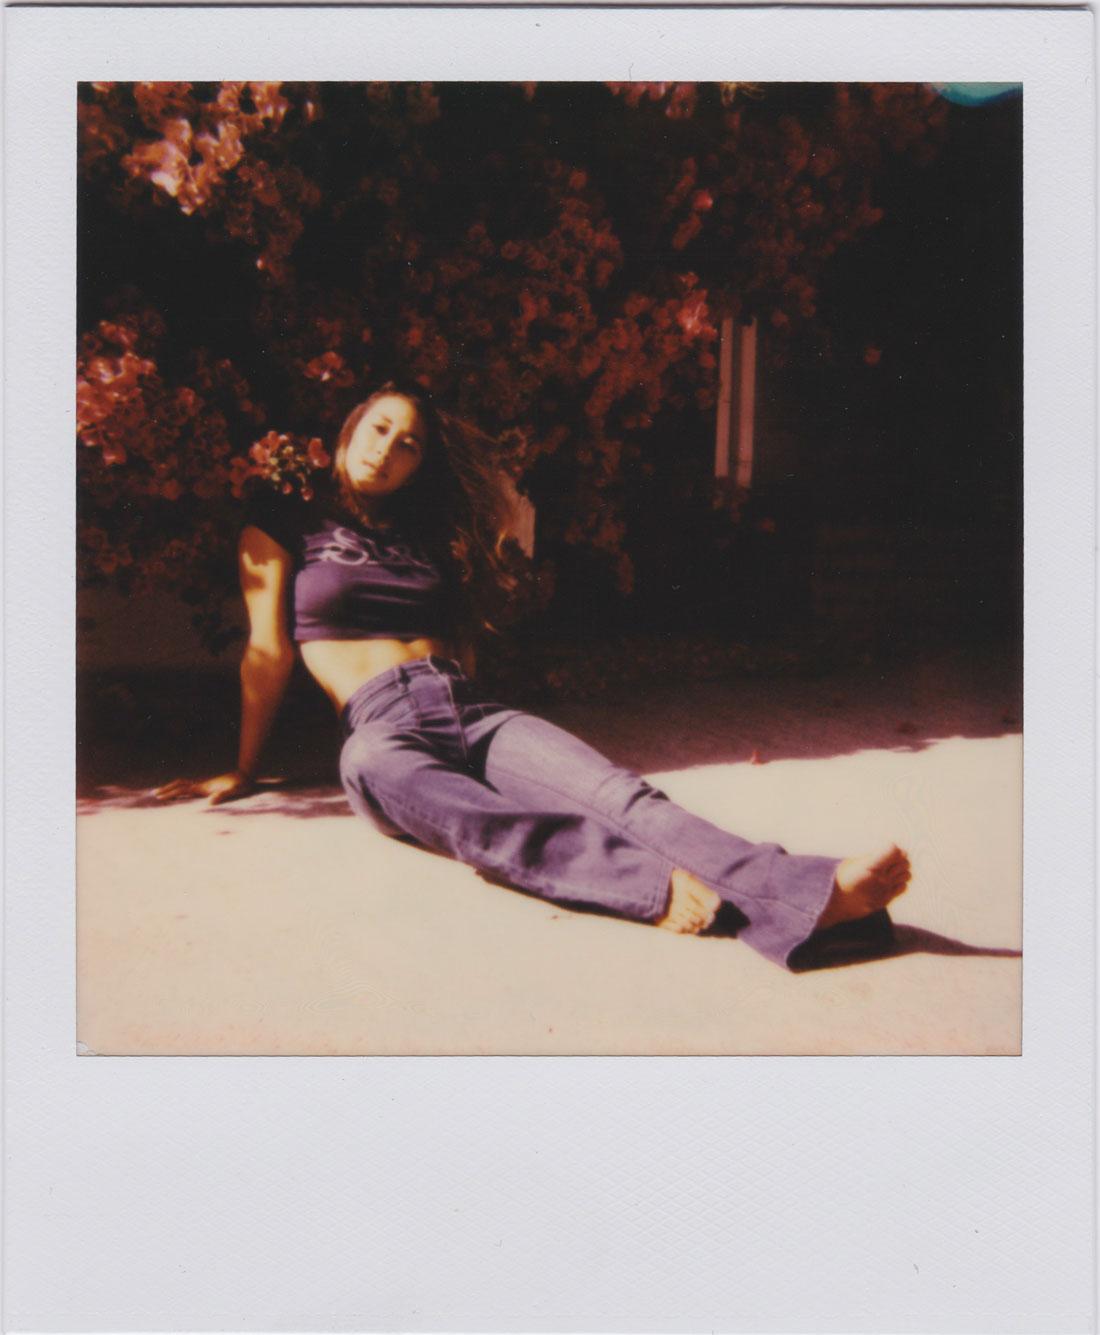 christina_choi_cxchoi_polaroid_3.jpg